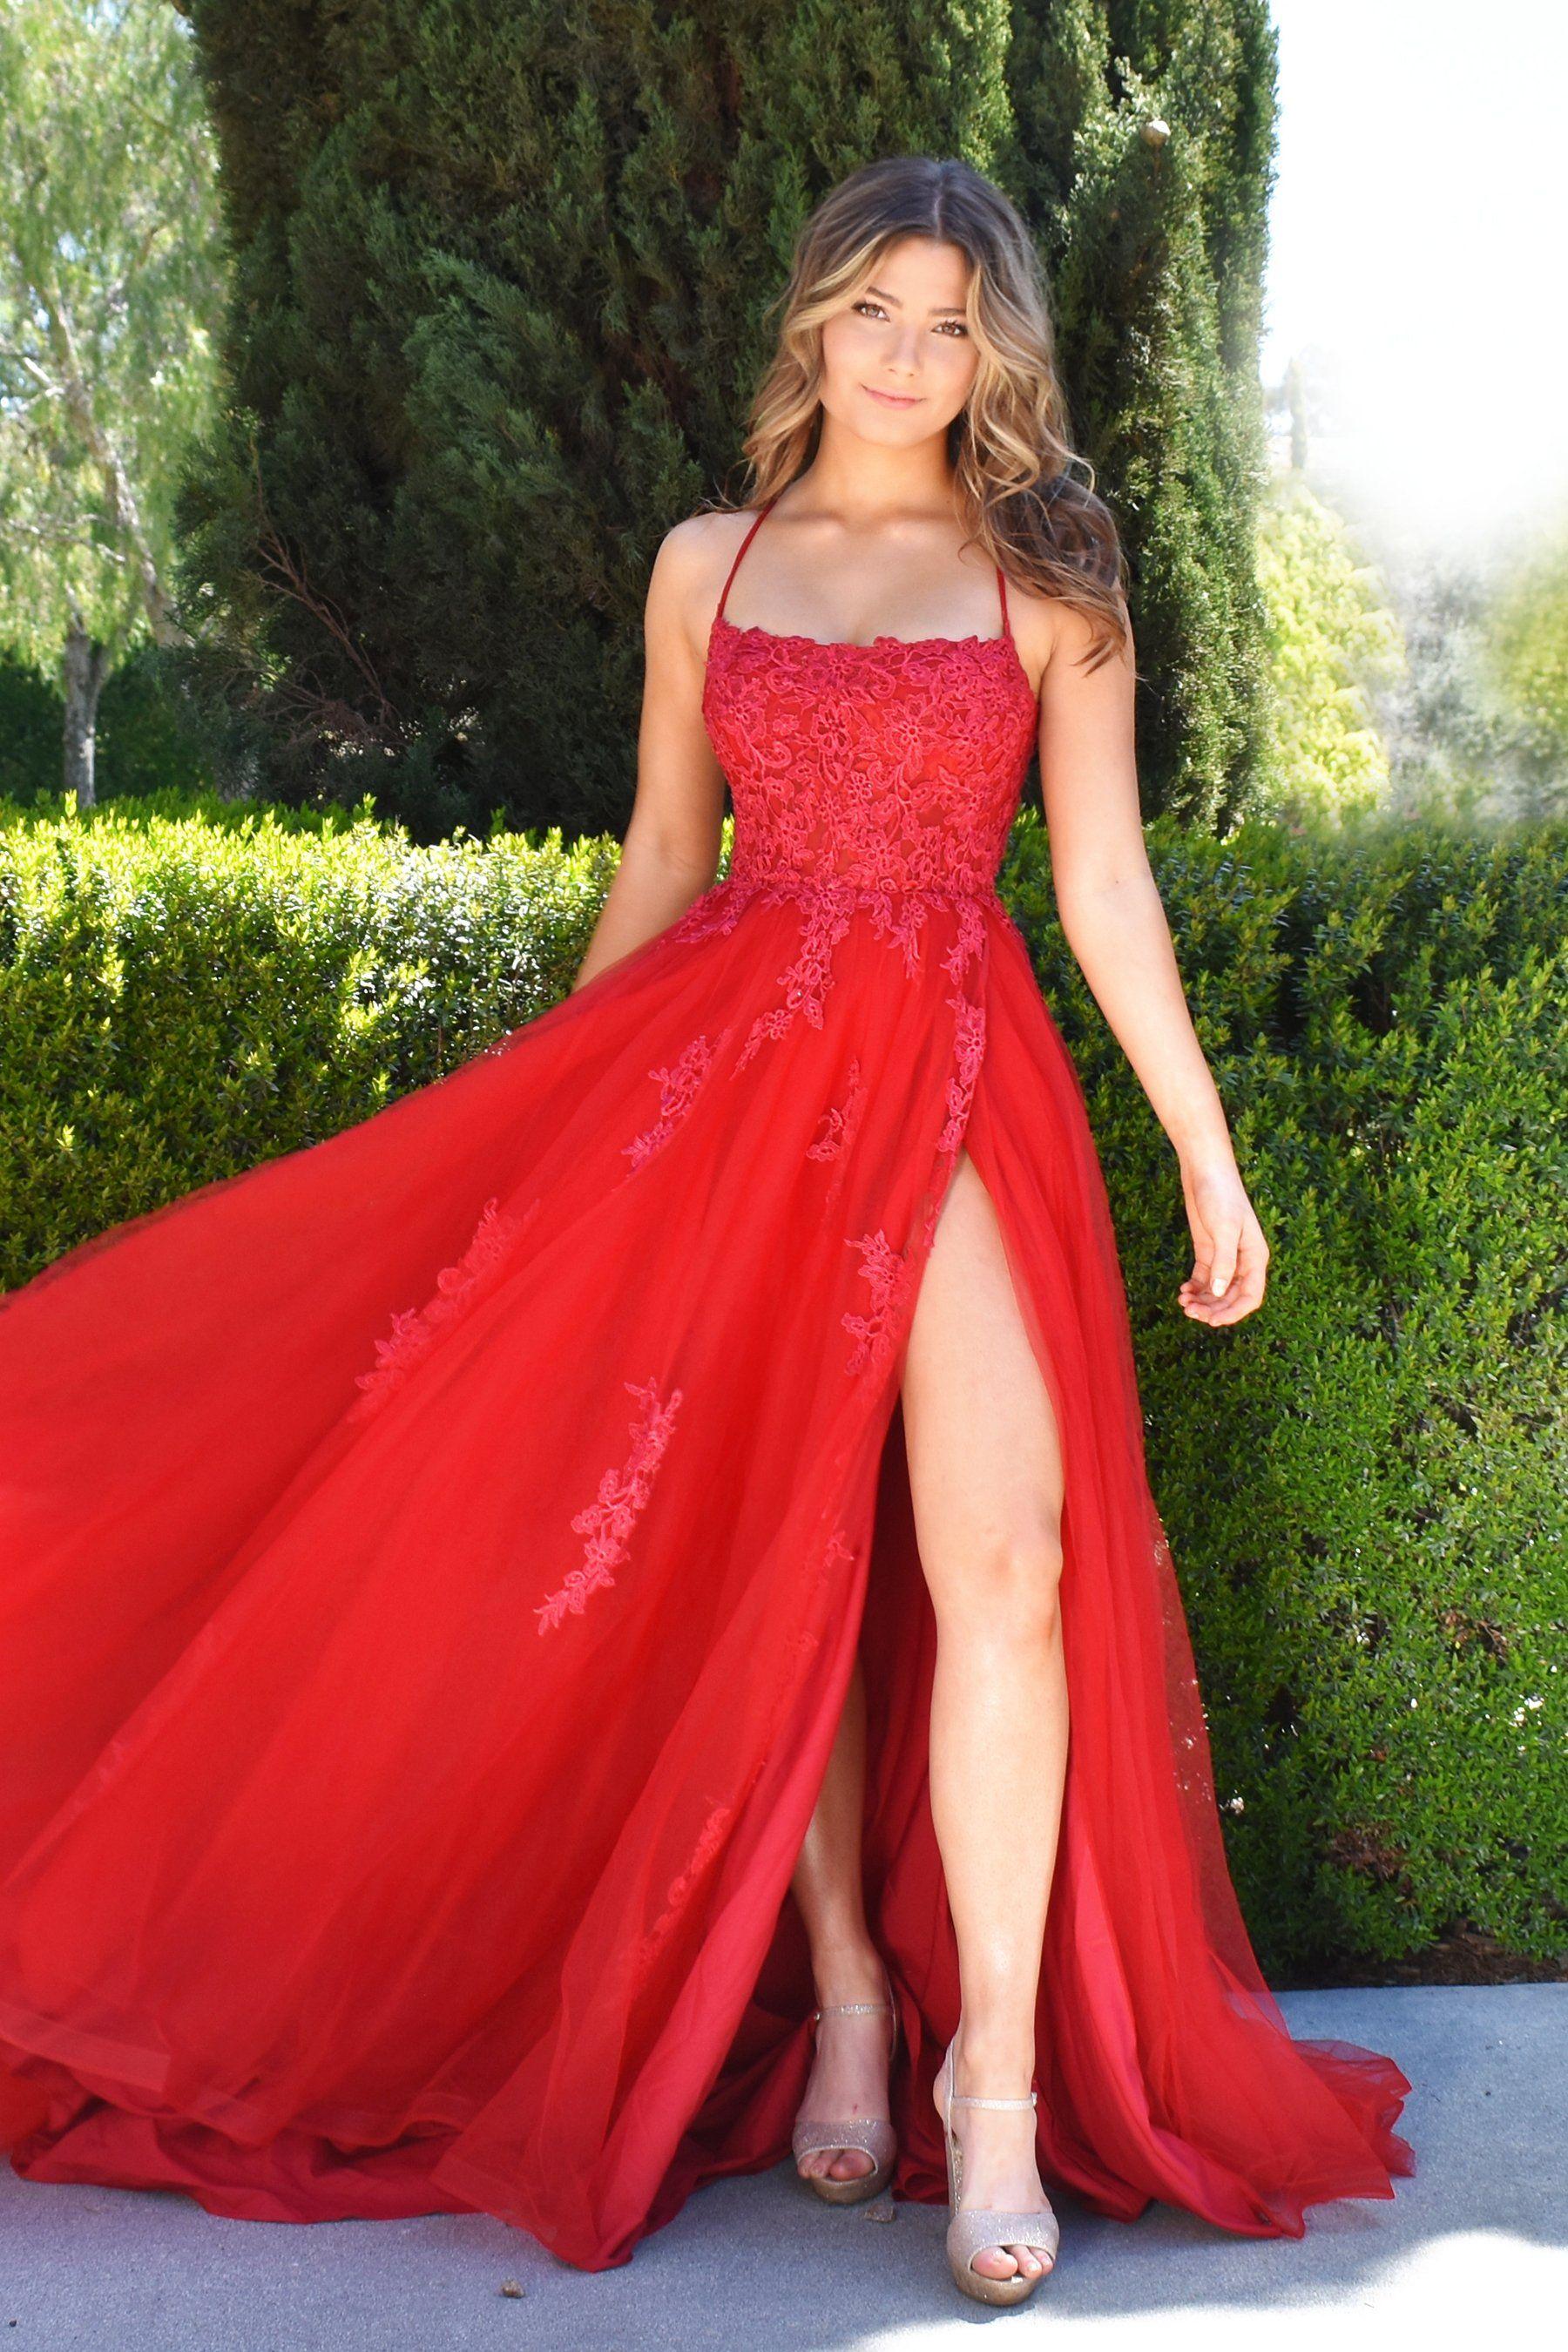 Alisha Gown Red Prom Dress Long Red Prom Dress Red Prom Dresses Long Elegant [ 2700 x 1800 Pixel ]